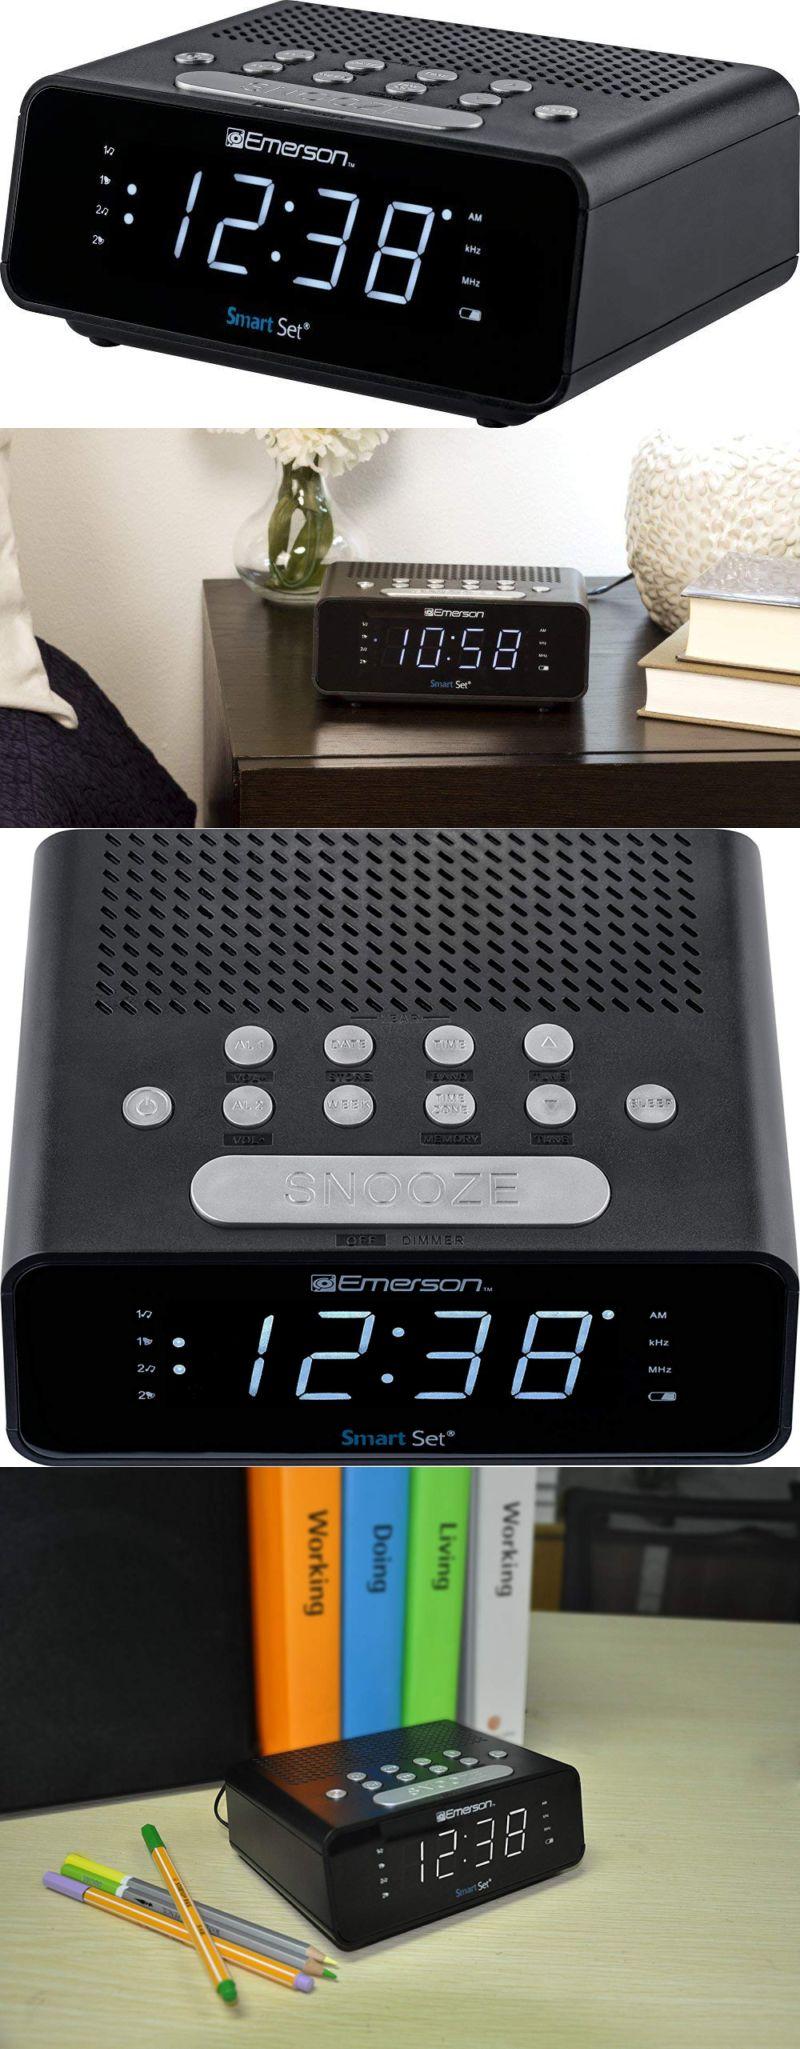 Itoma Bluetooth Clock Radio Fm Bedside Dual Alarm Dimmer Control Snooze Sleep Timer Usb Charging Aux Radio Alarm Clock Digital Clock Radio Digital Alarm Clock